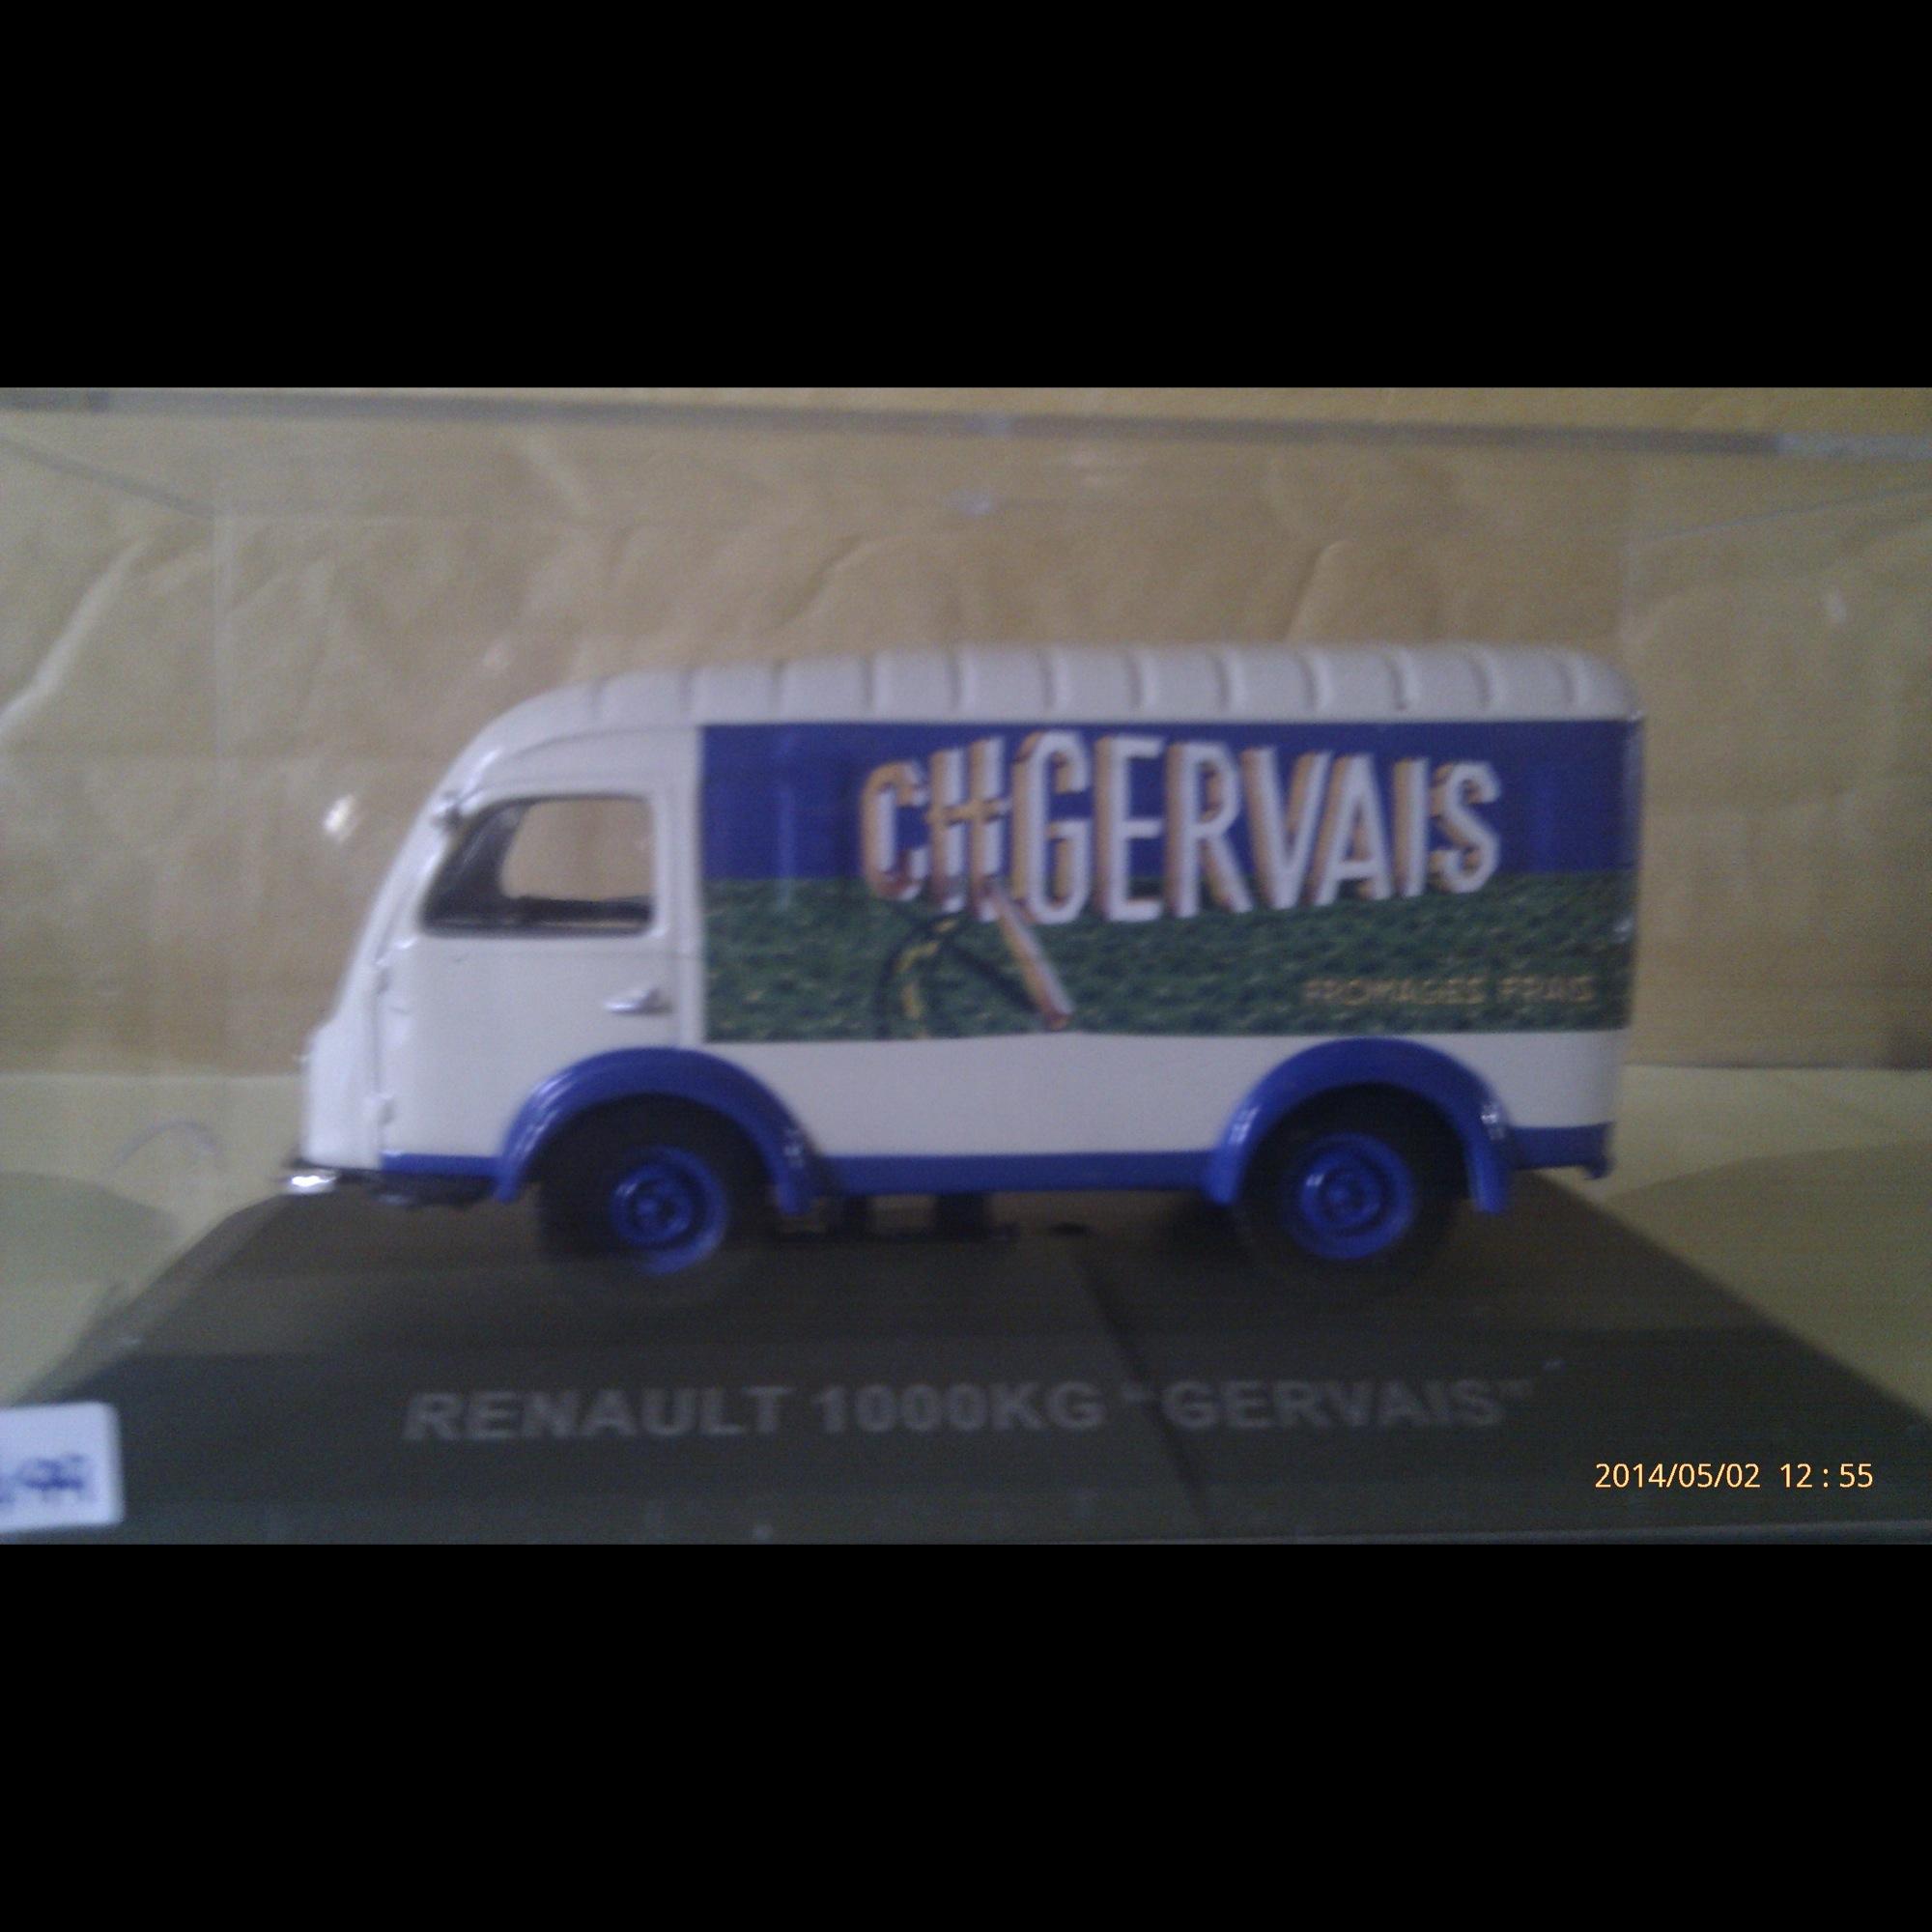 "Renault 1000KG ""Gervais"""